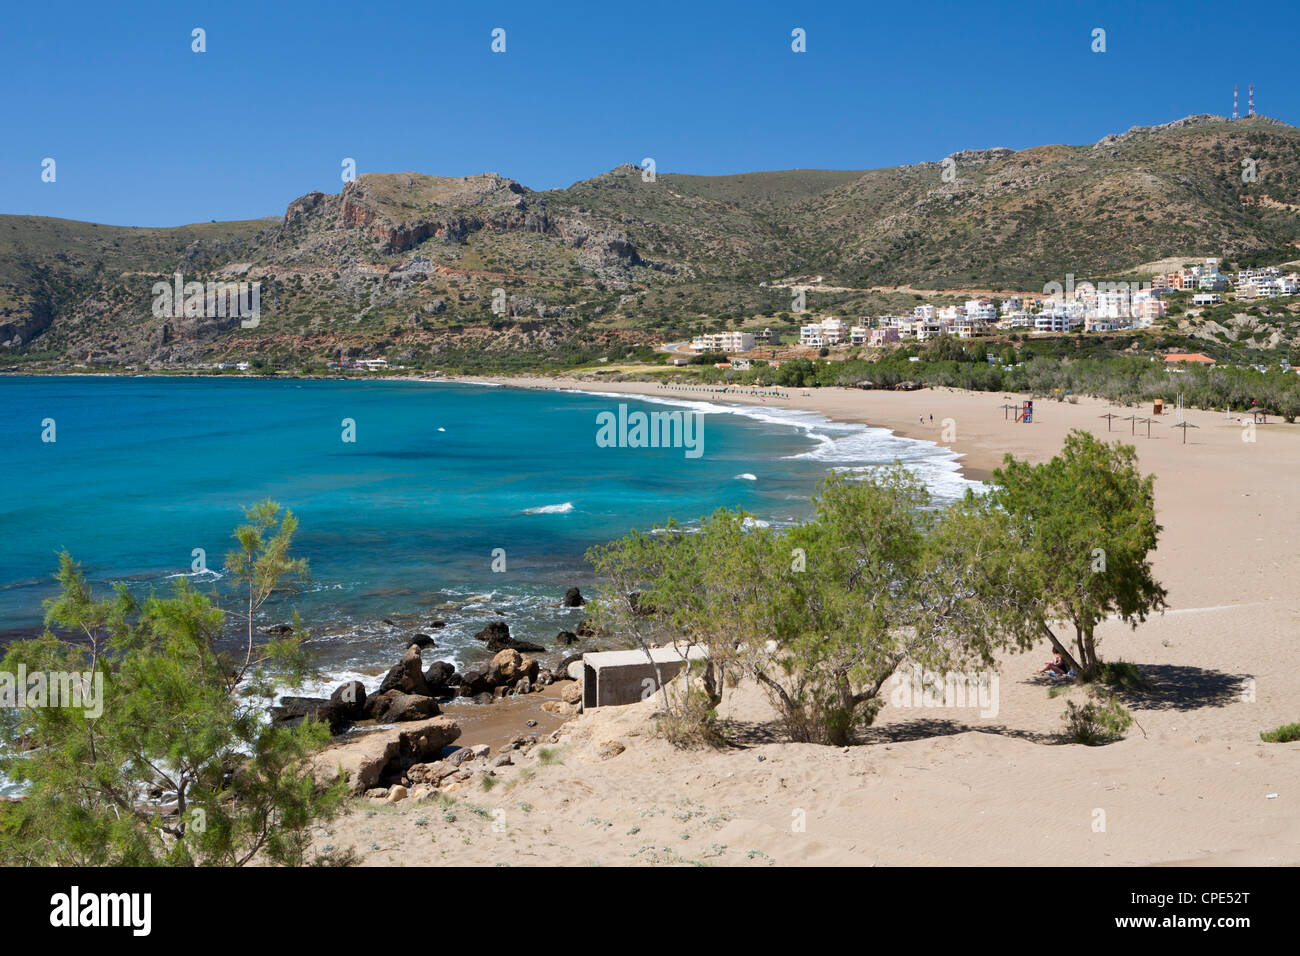 Beach view, Paleohora, Chania region, Crete, Greek Islands, Greece, Europe - Stock Image